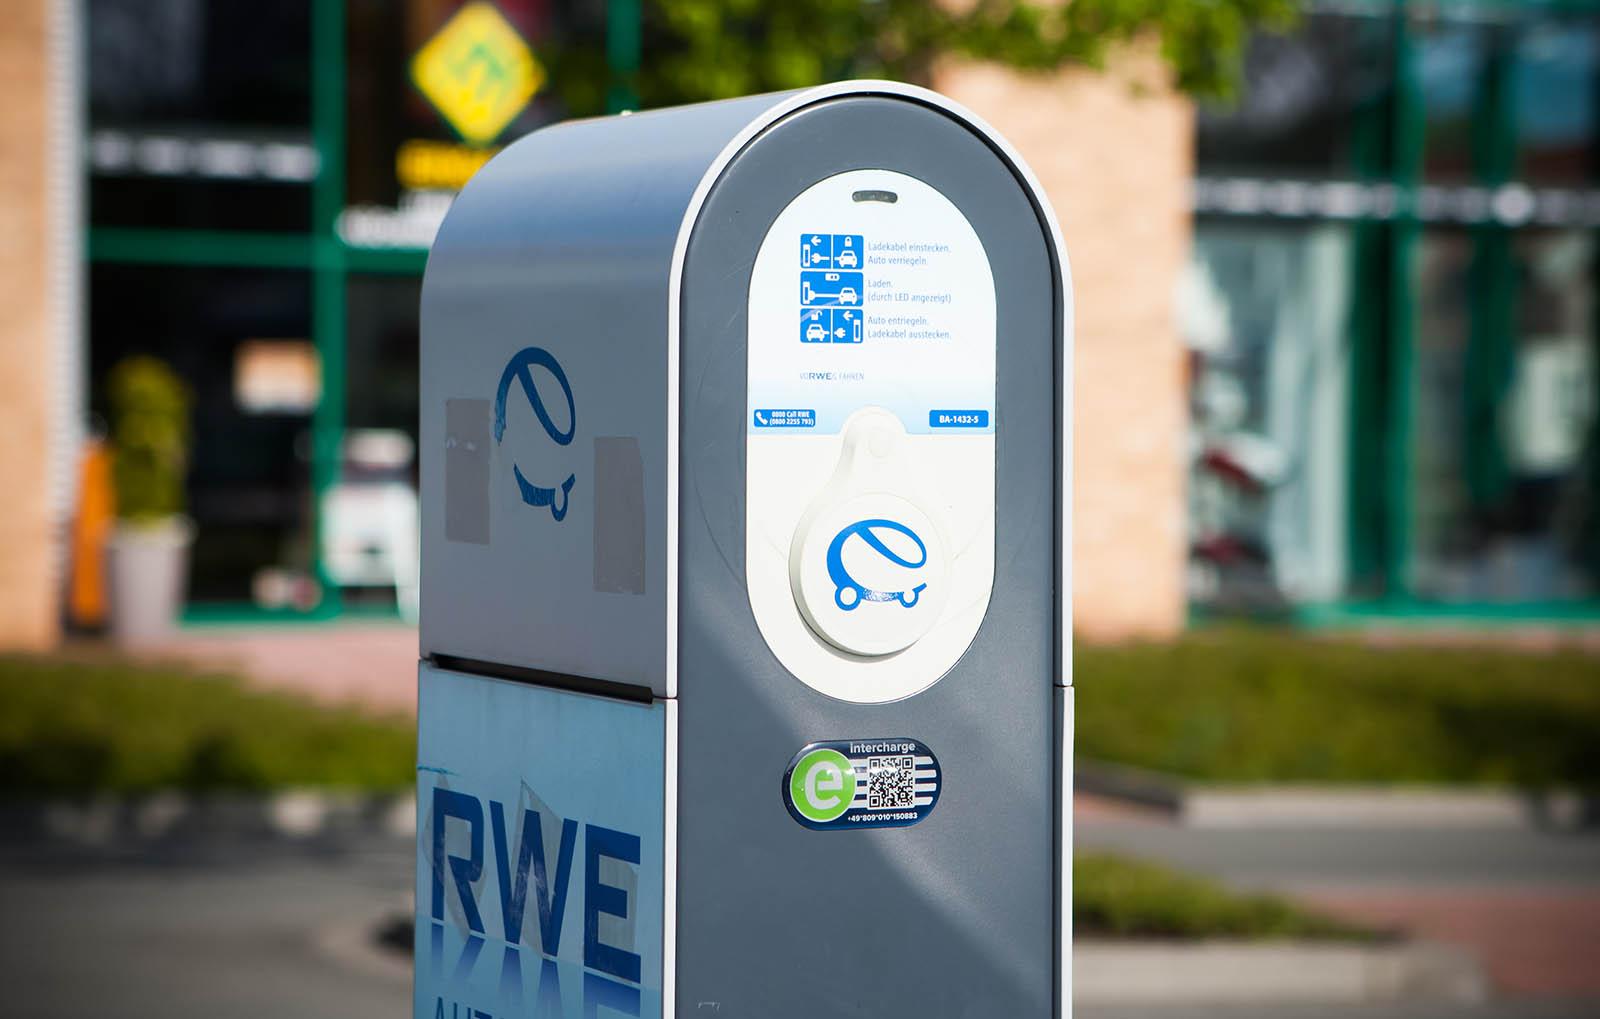 BerliiniAmsterdam-RWE-intercharge2